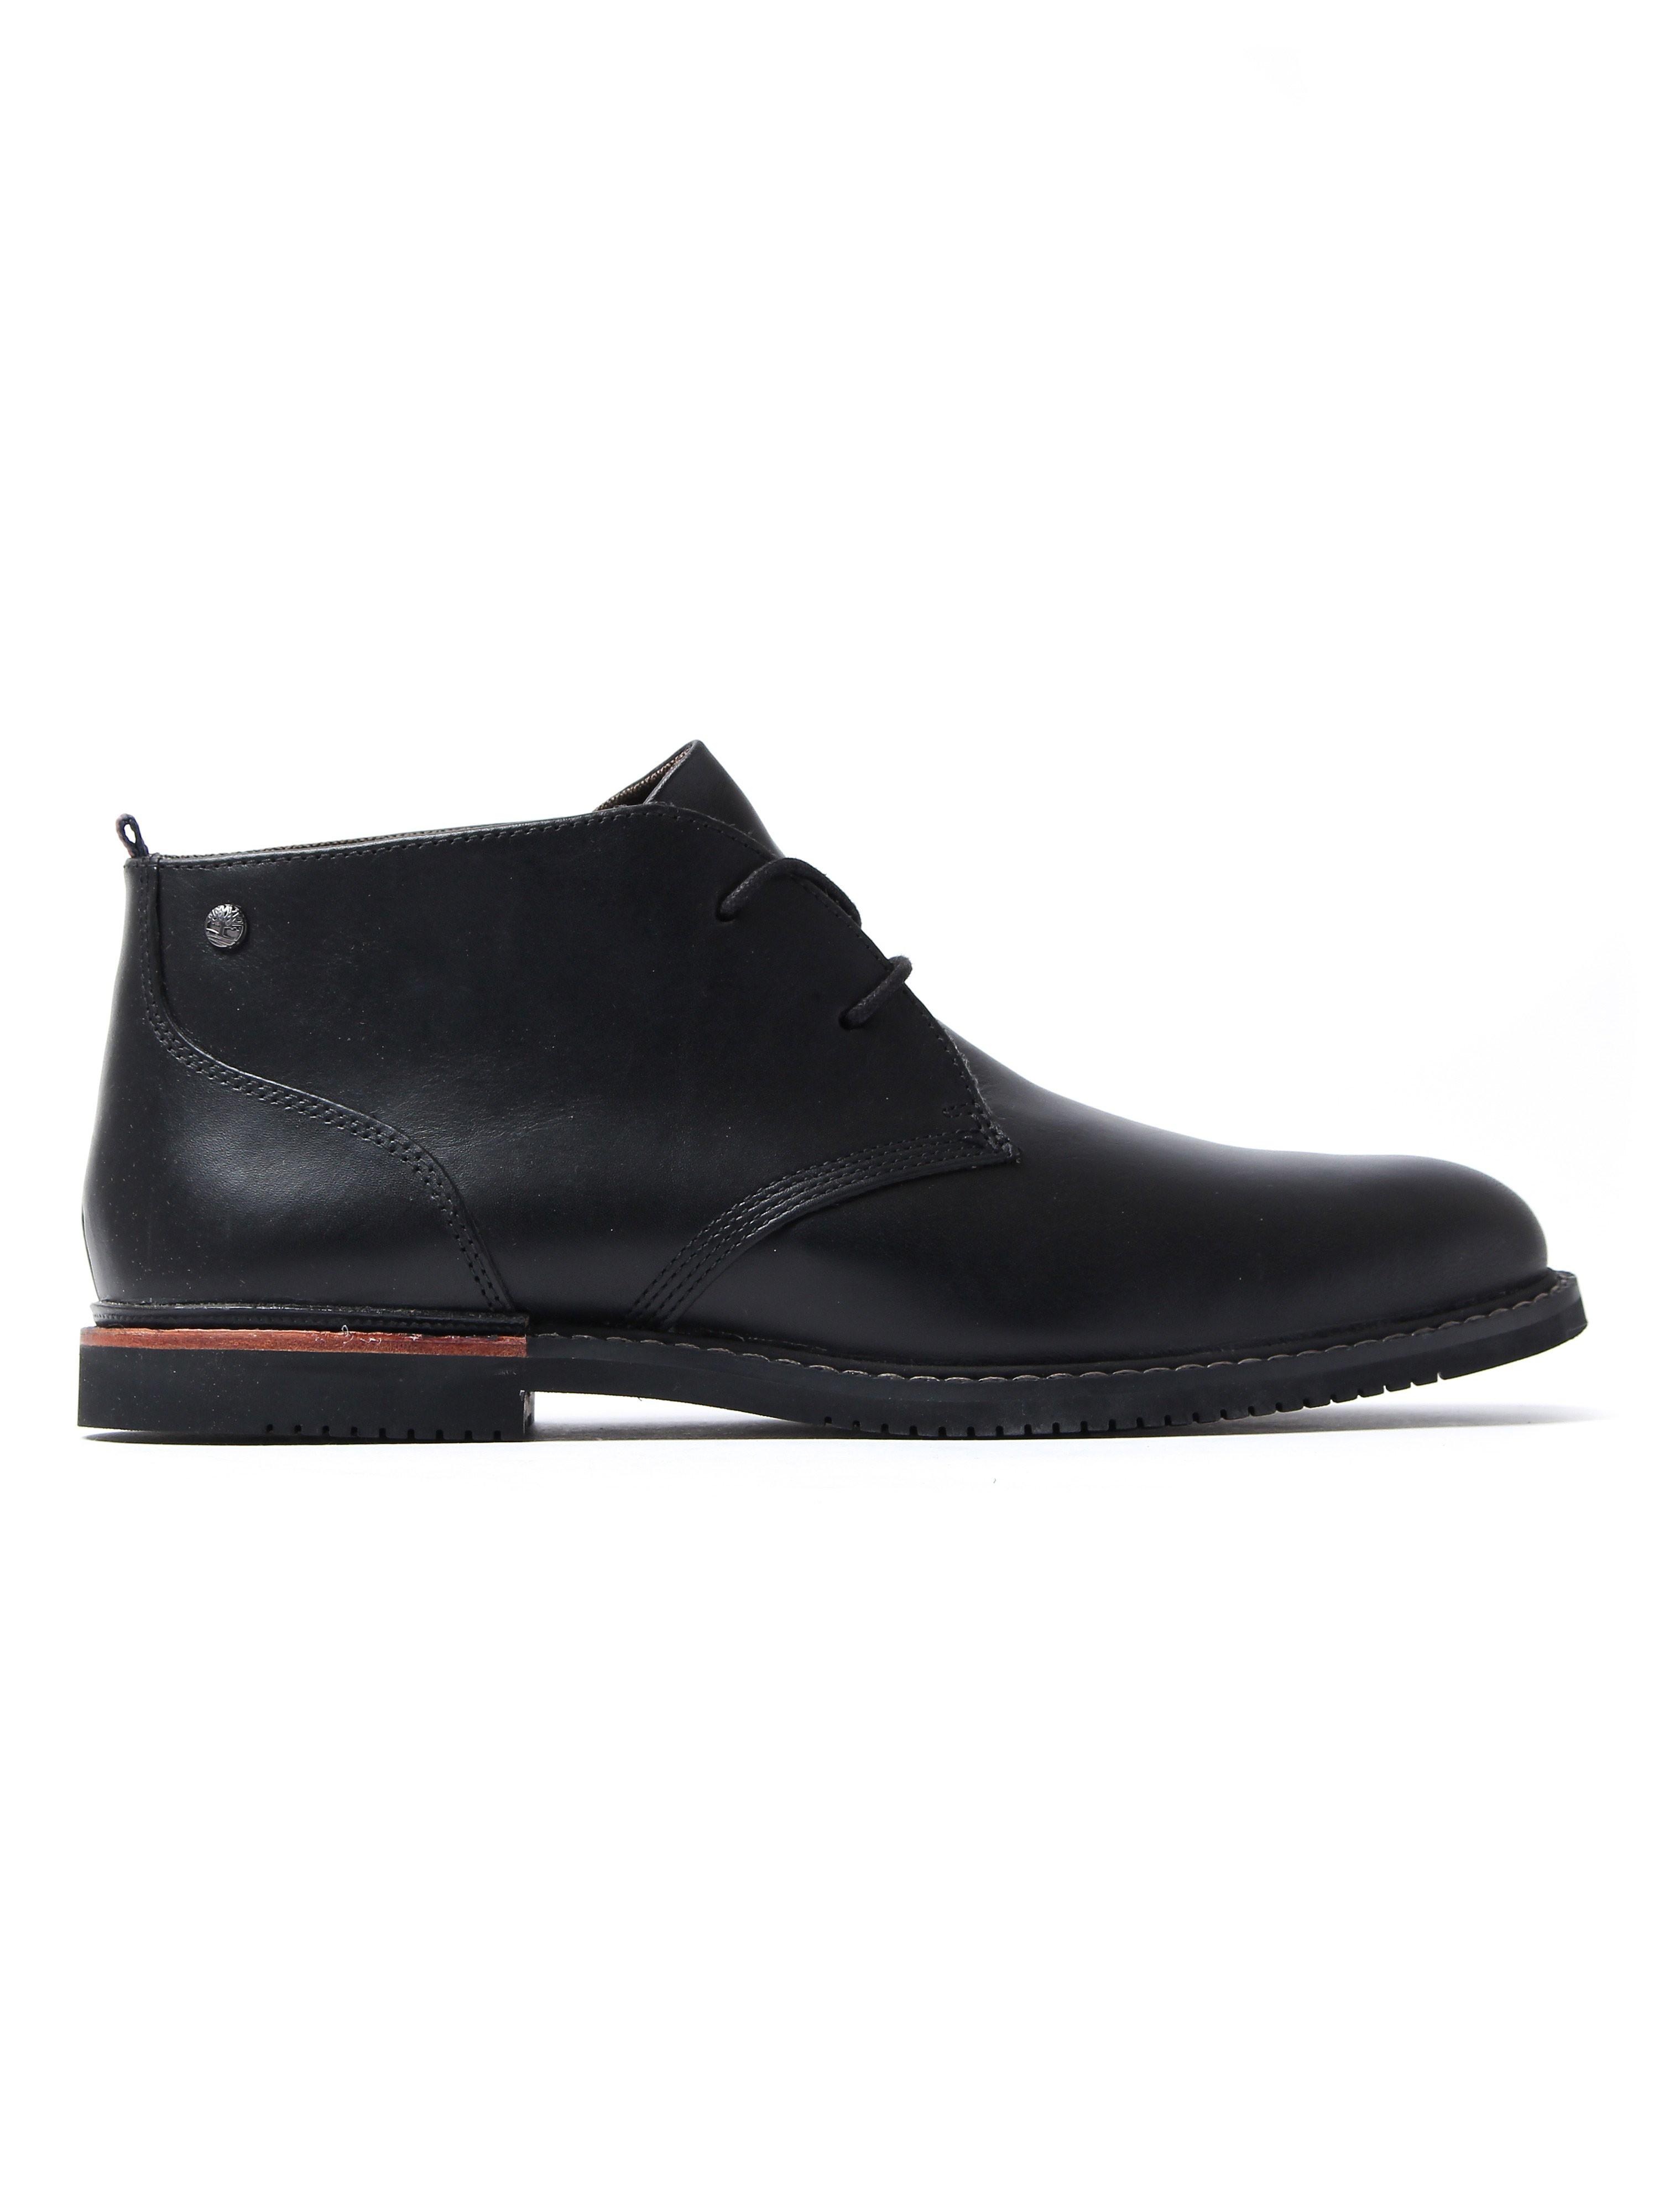 Timberland Men's Brook Park Chukka Boots - Black Leather